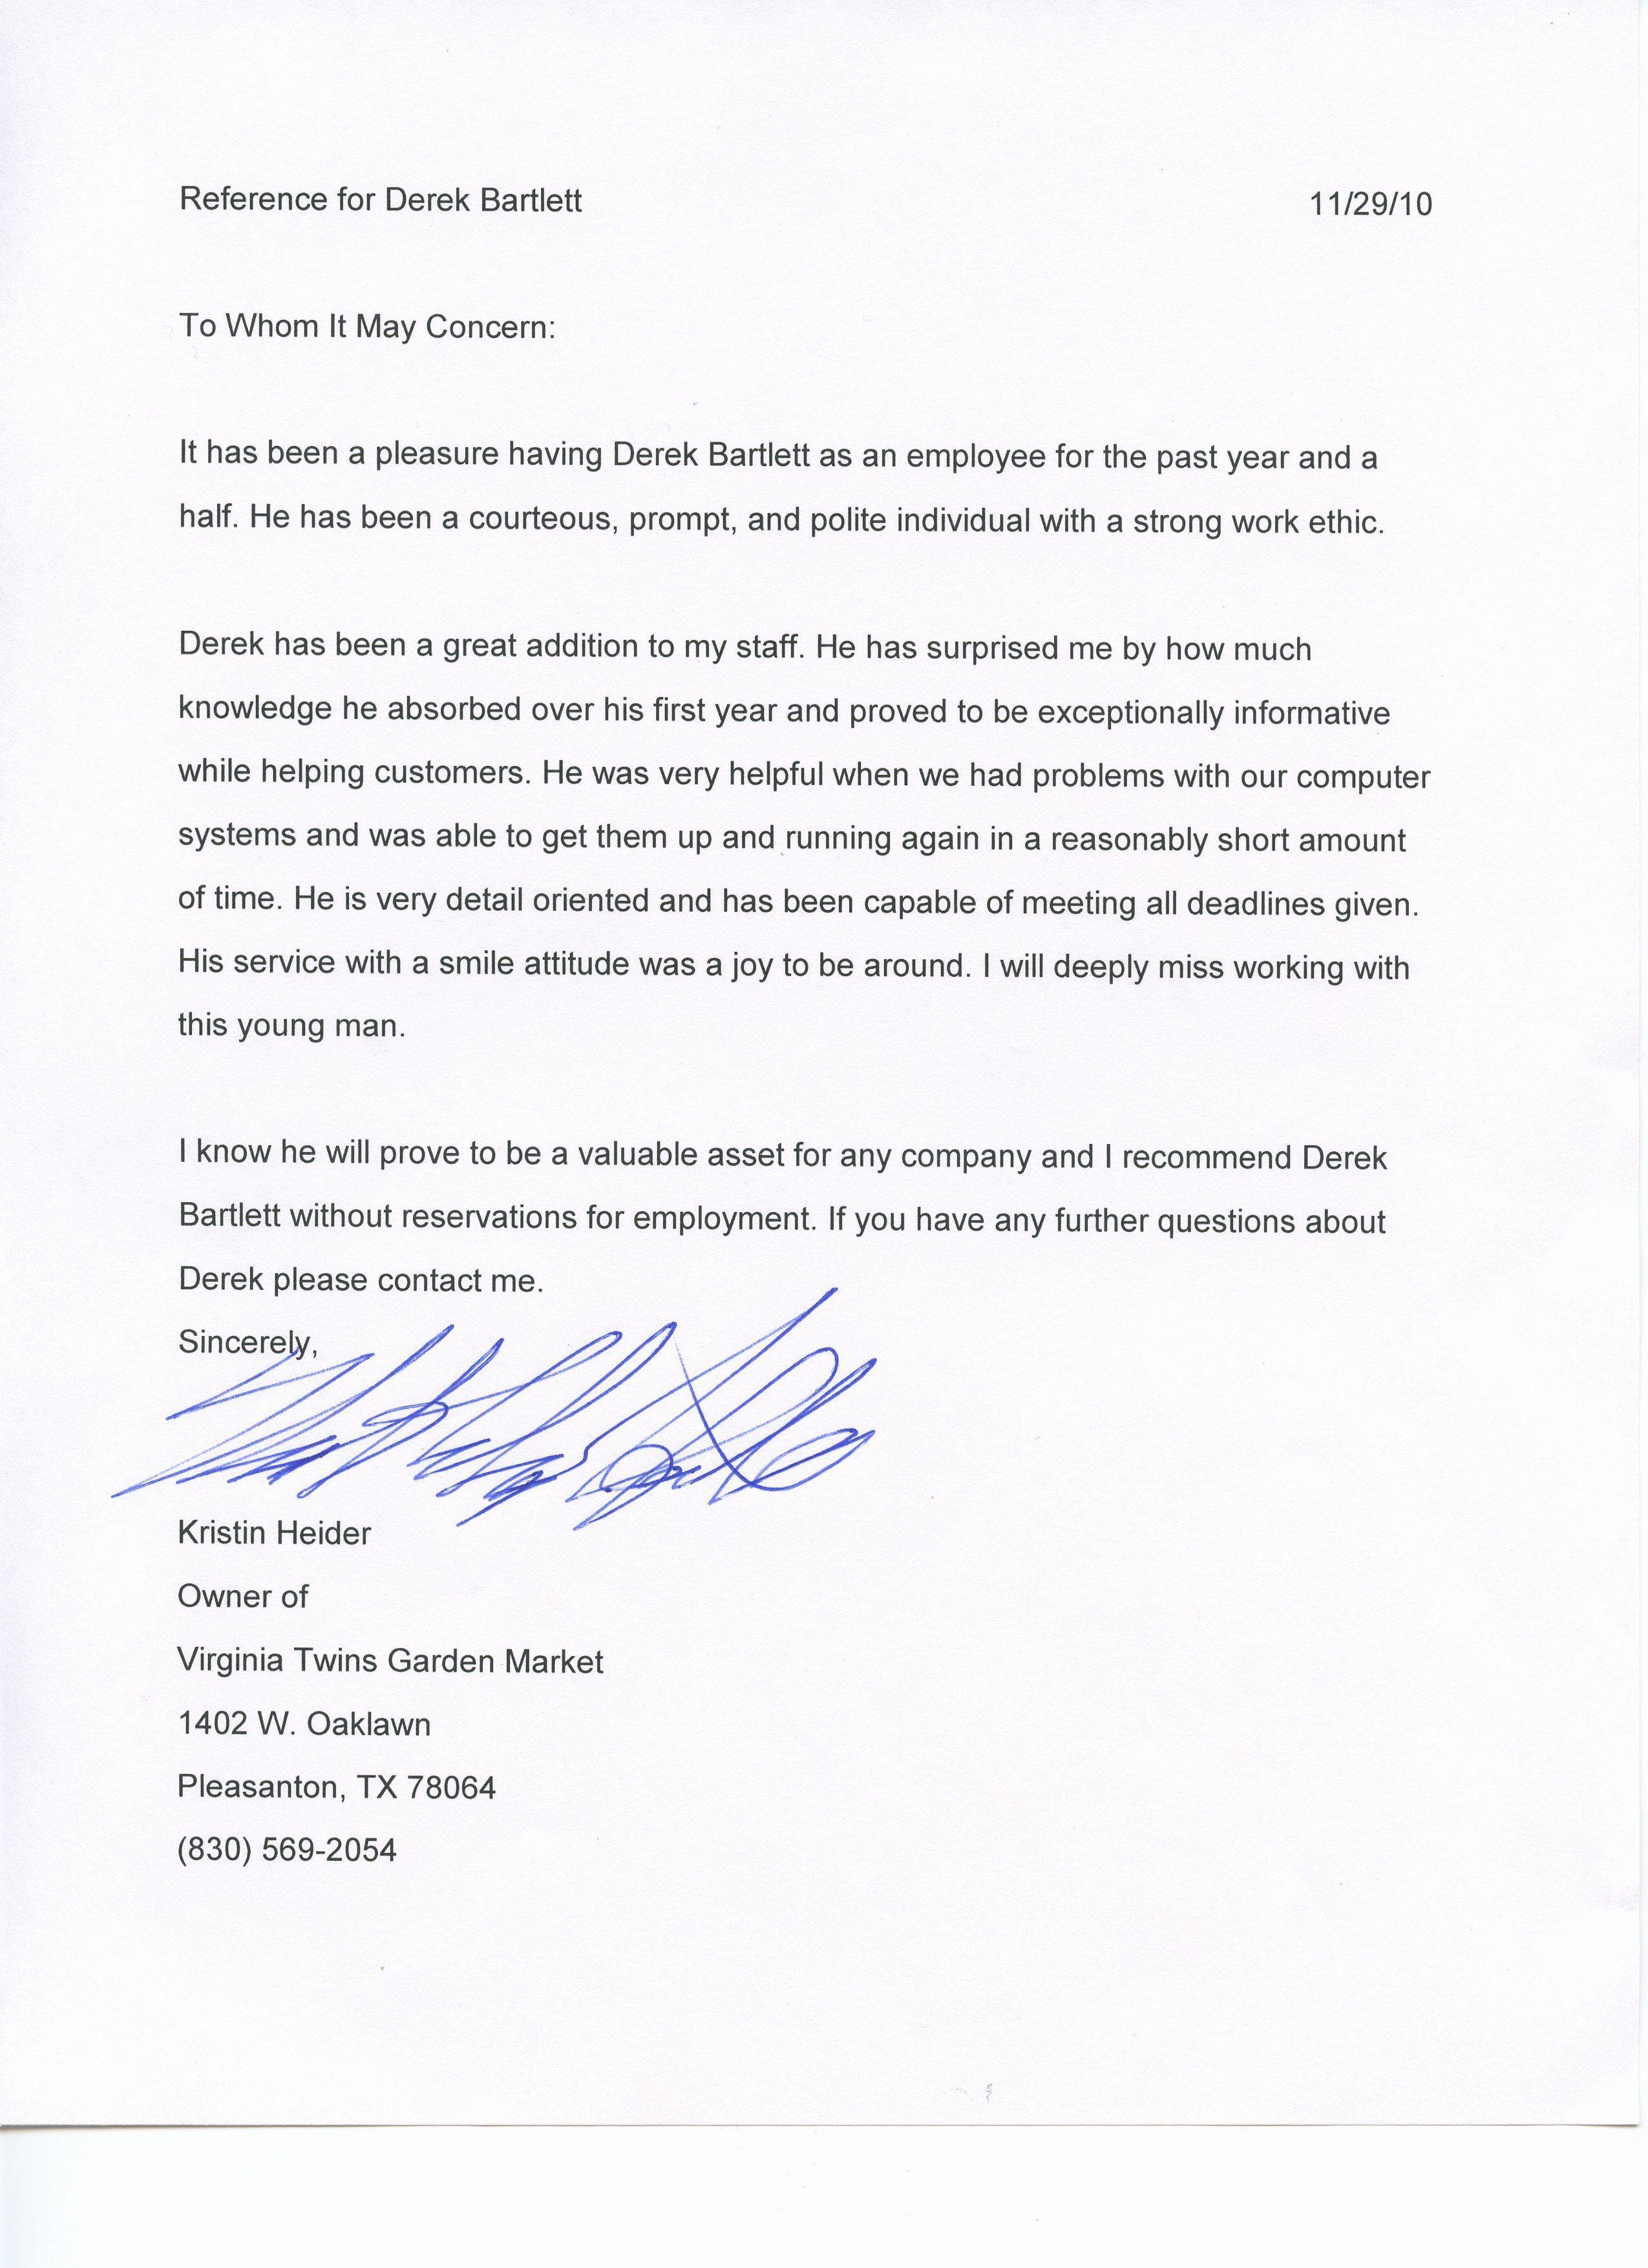 Texas Tech Letter Of New Derek Bartlett